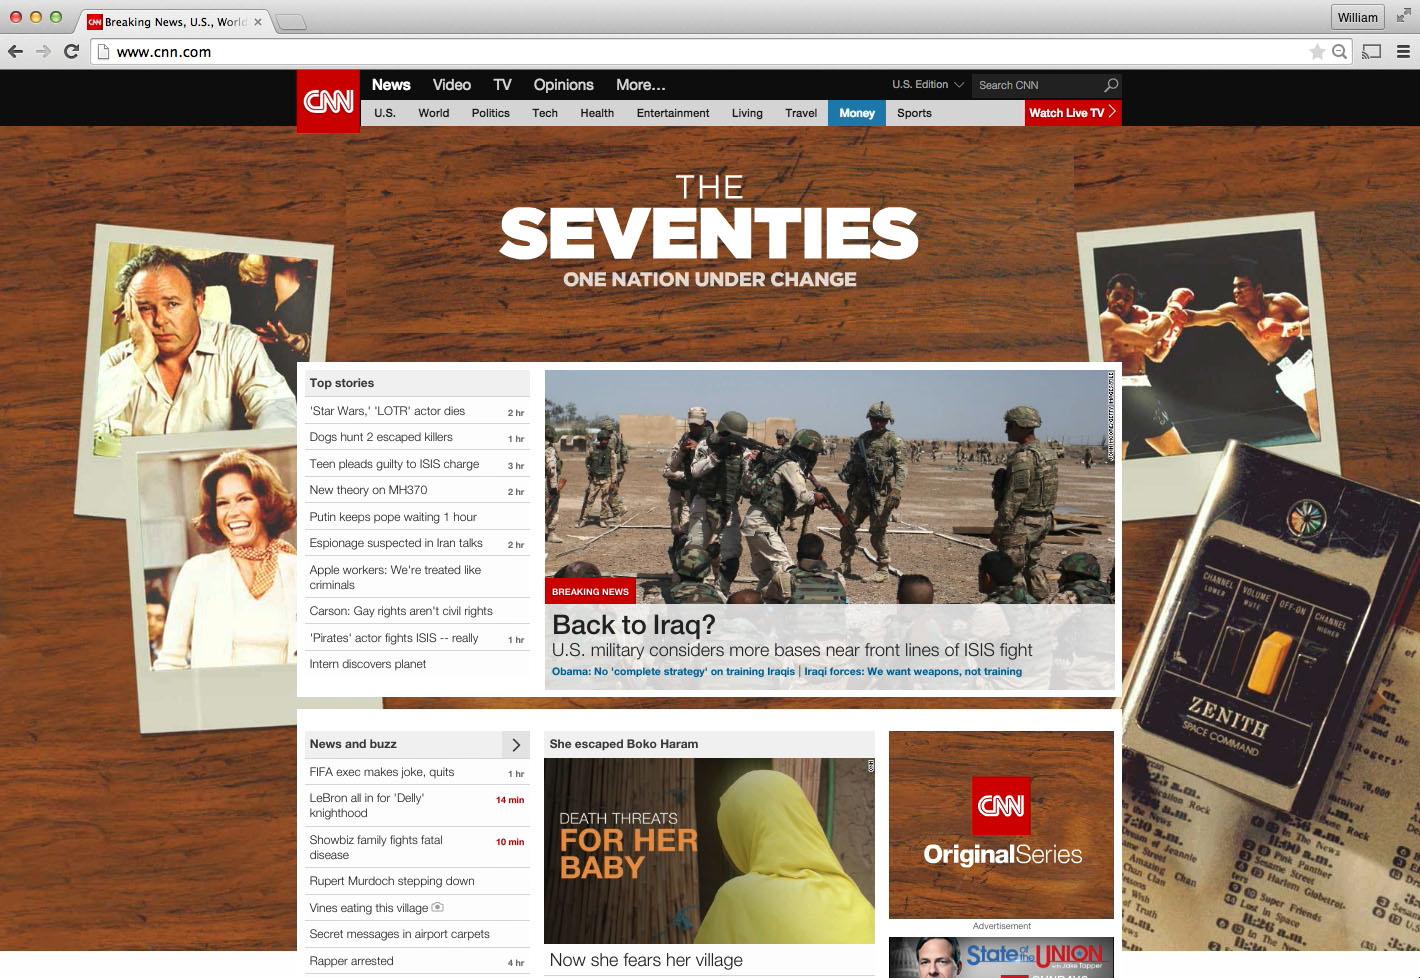 CNN_Digital_Takeovers_CNN.com_01.jpg